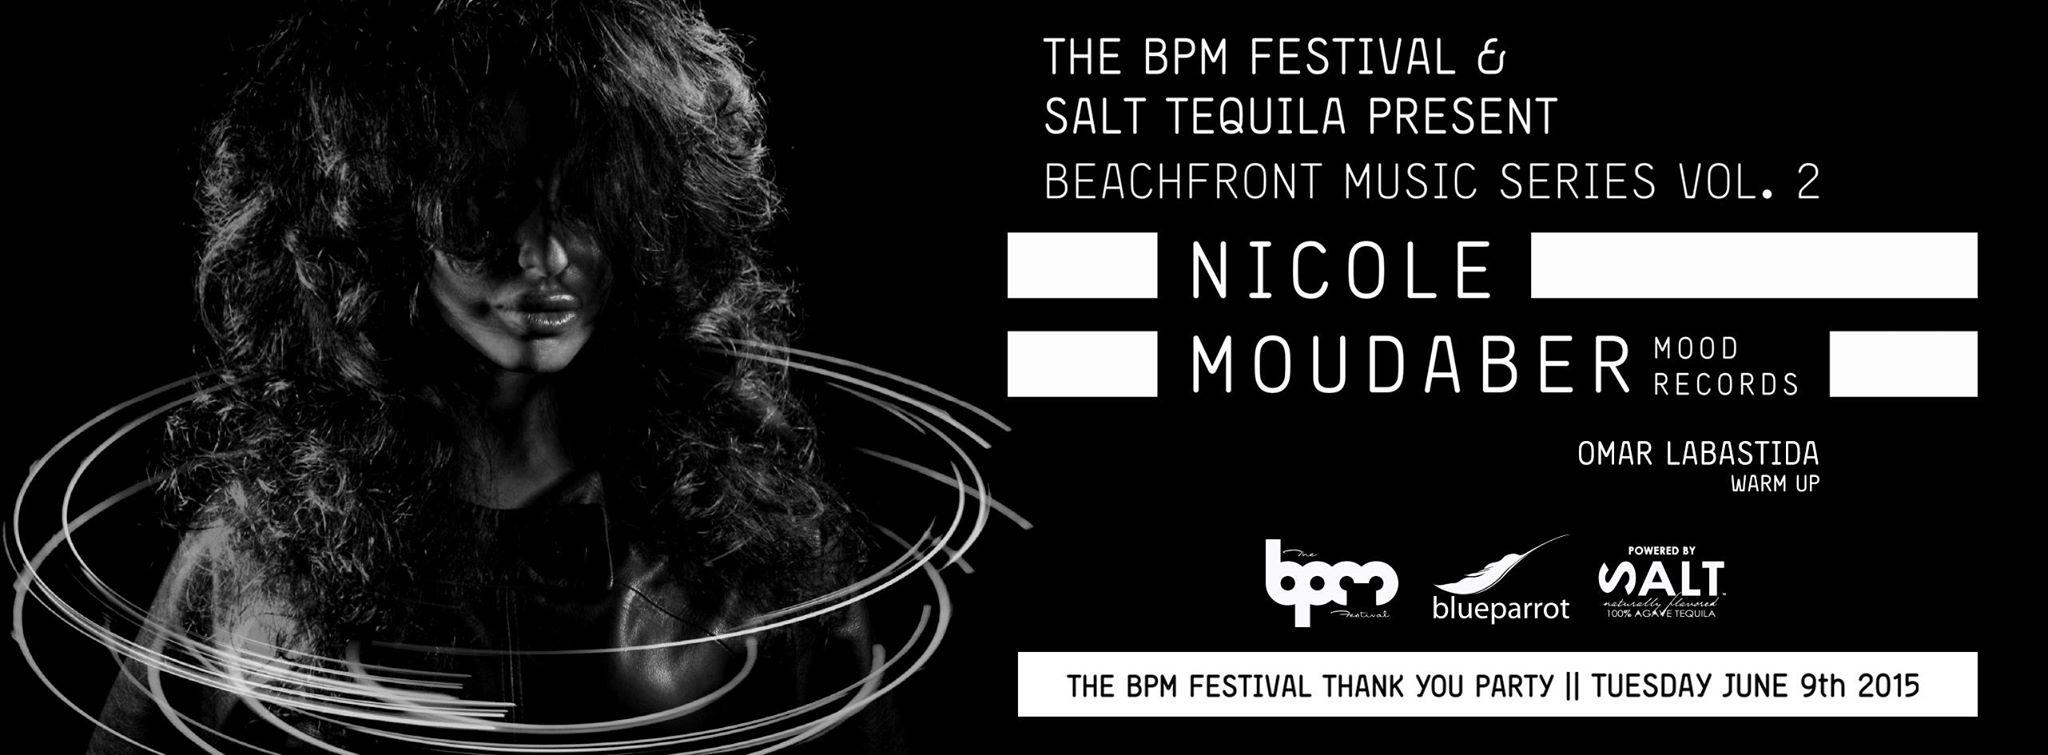 Nicole Moudaber @ Blue Parrot - Playa del Carmen